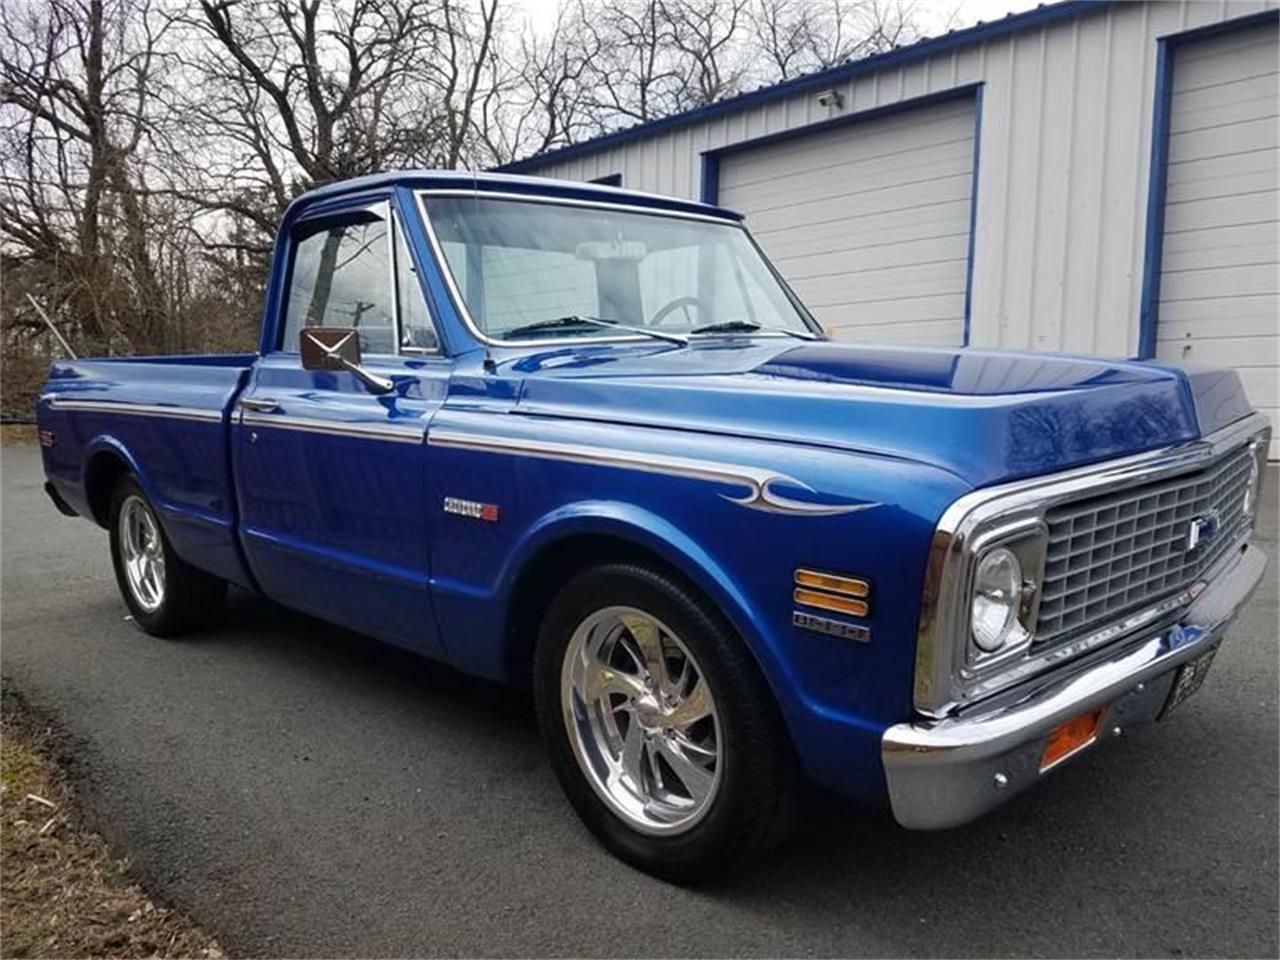 1971 Chevrolet Cheyenne (CC-1196650) for sale in Clarksburg, Maryland